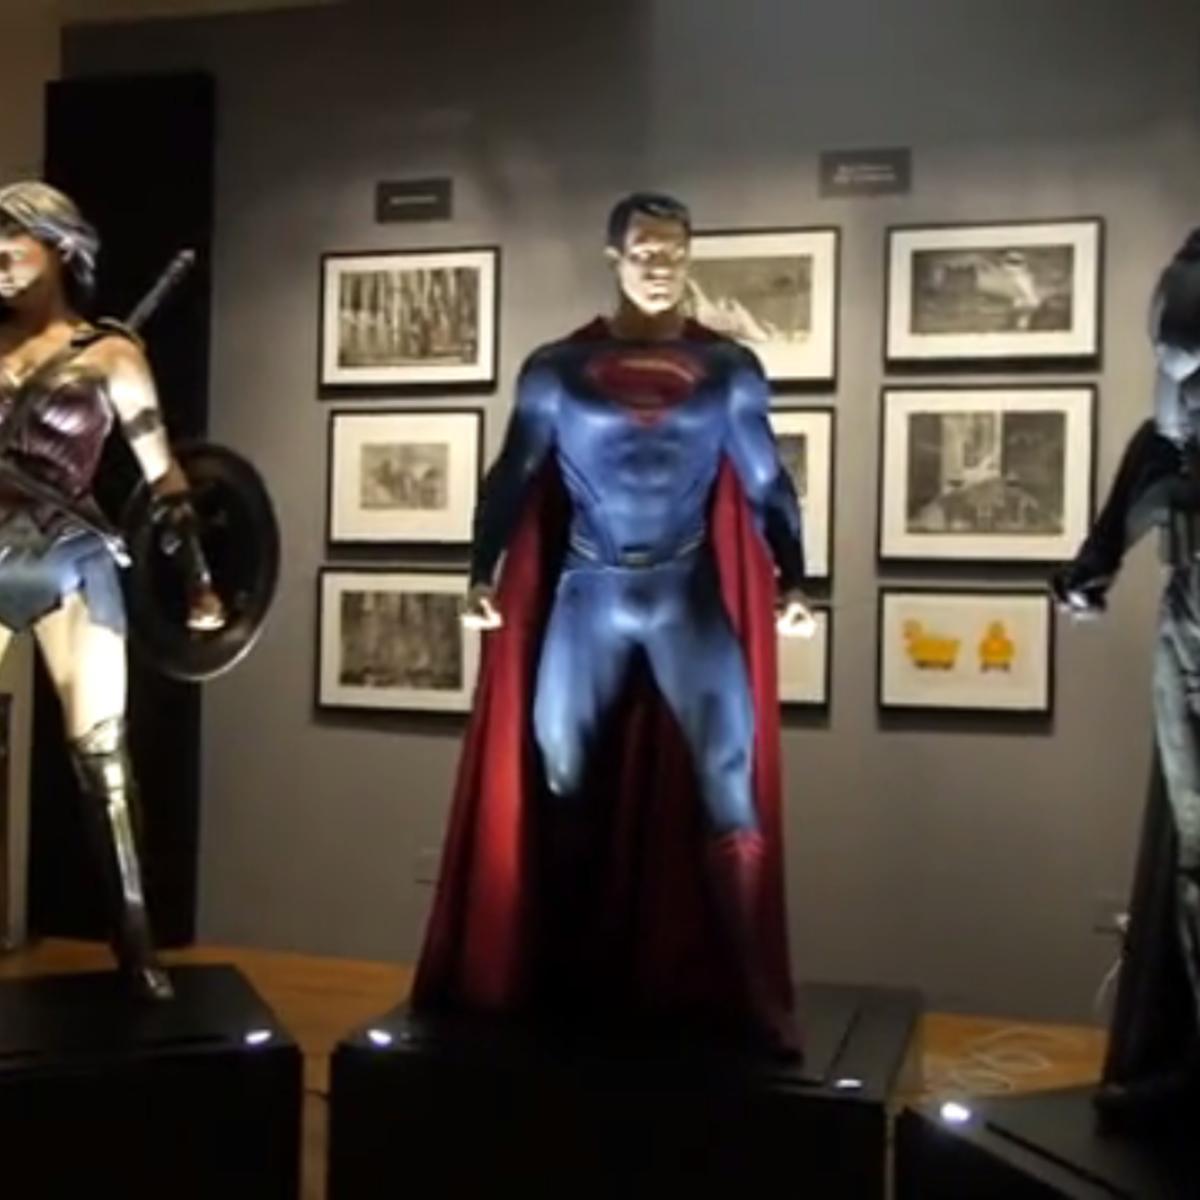 BatmanVSuperman_MuseumTour_ScreenCap_0.png